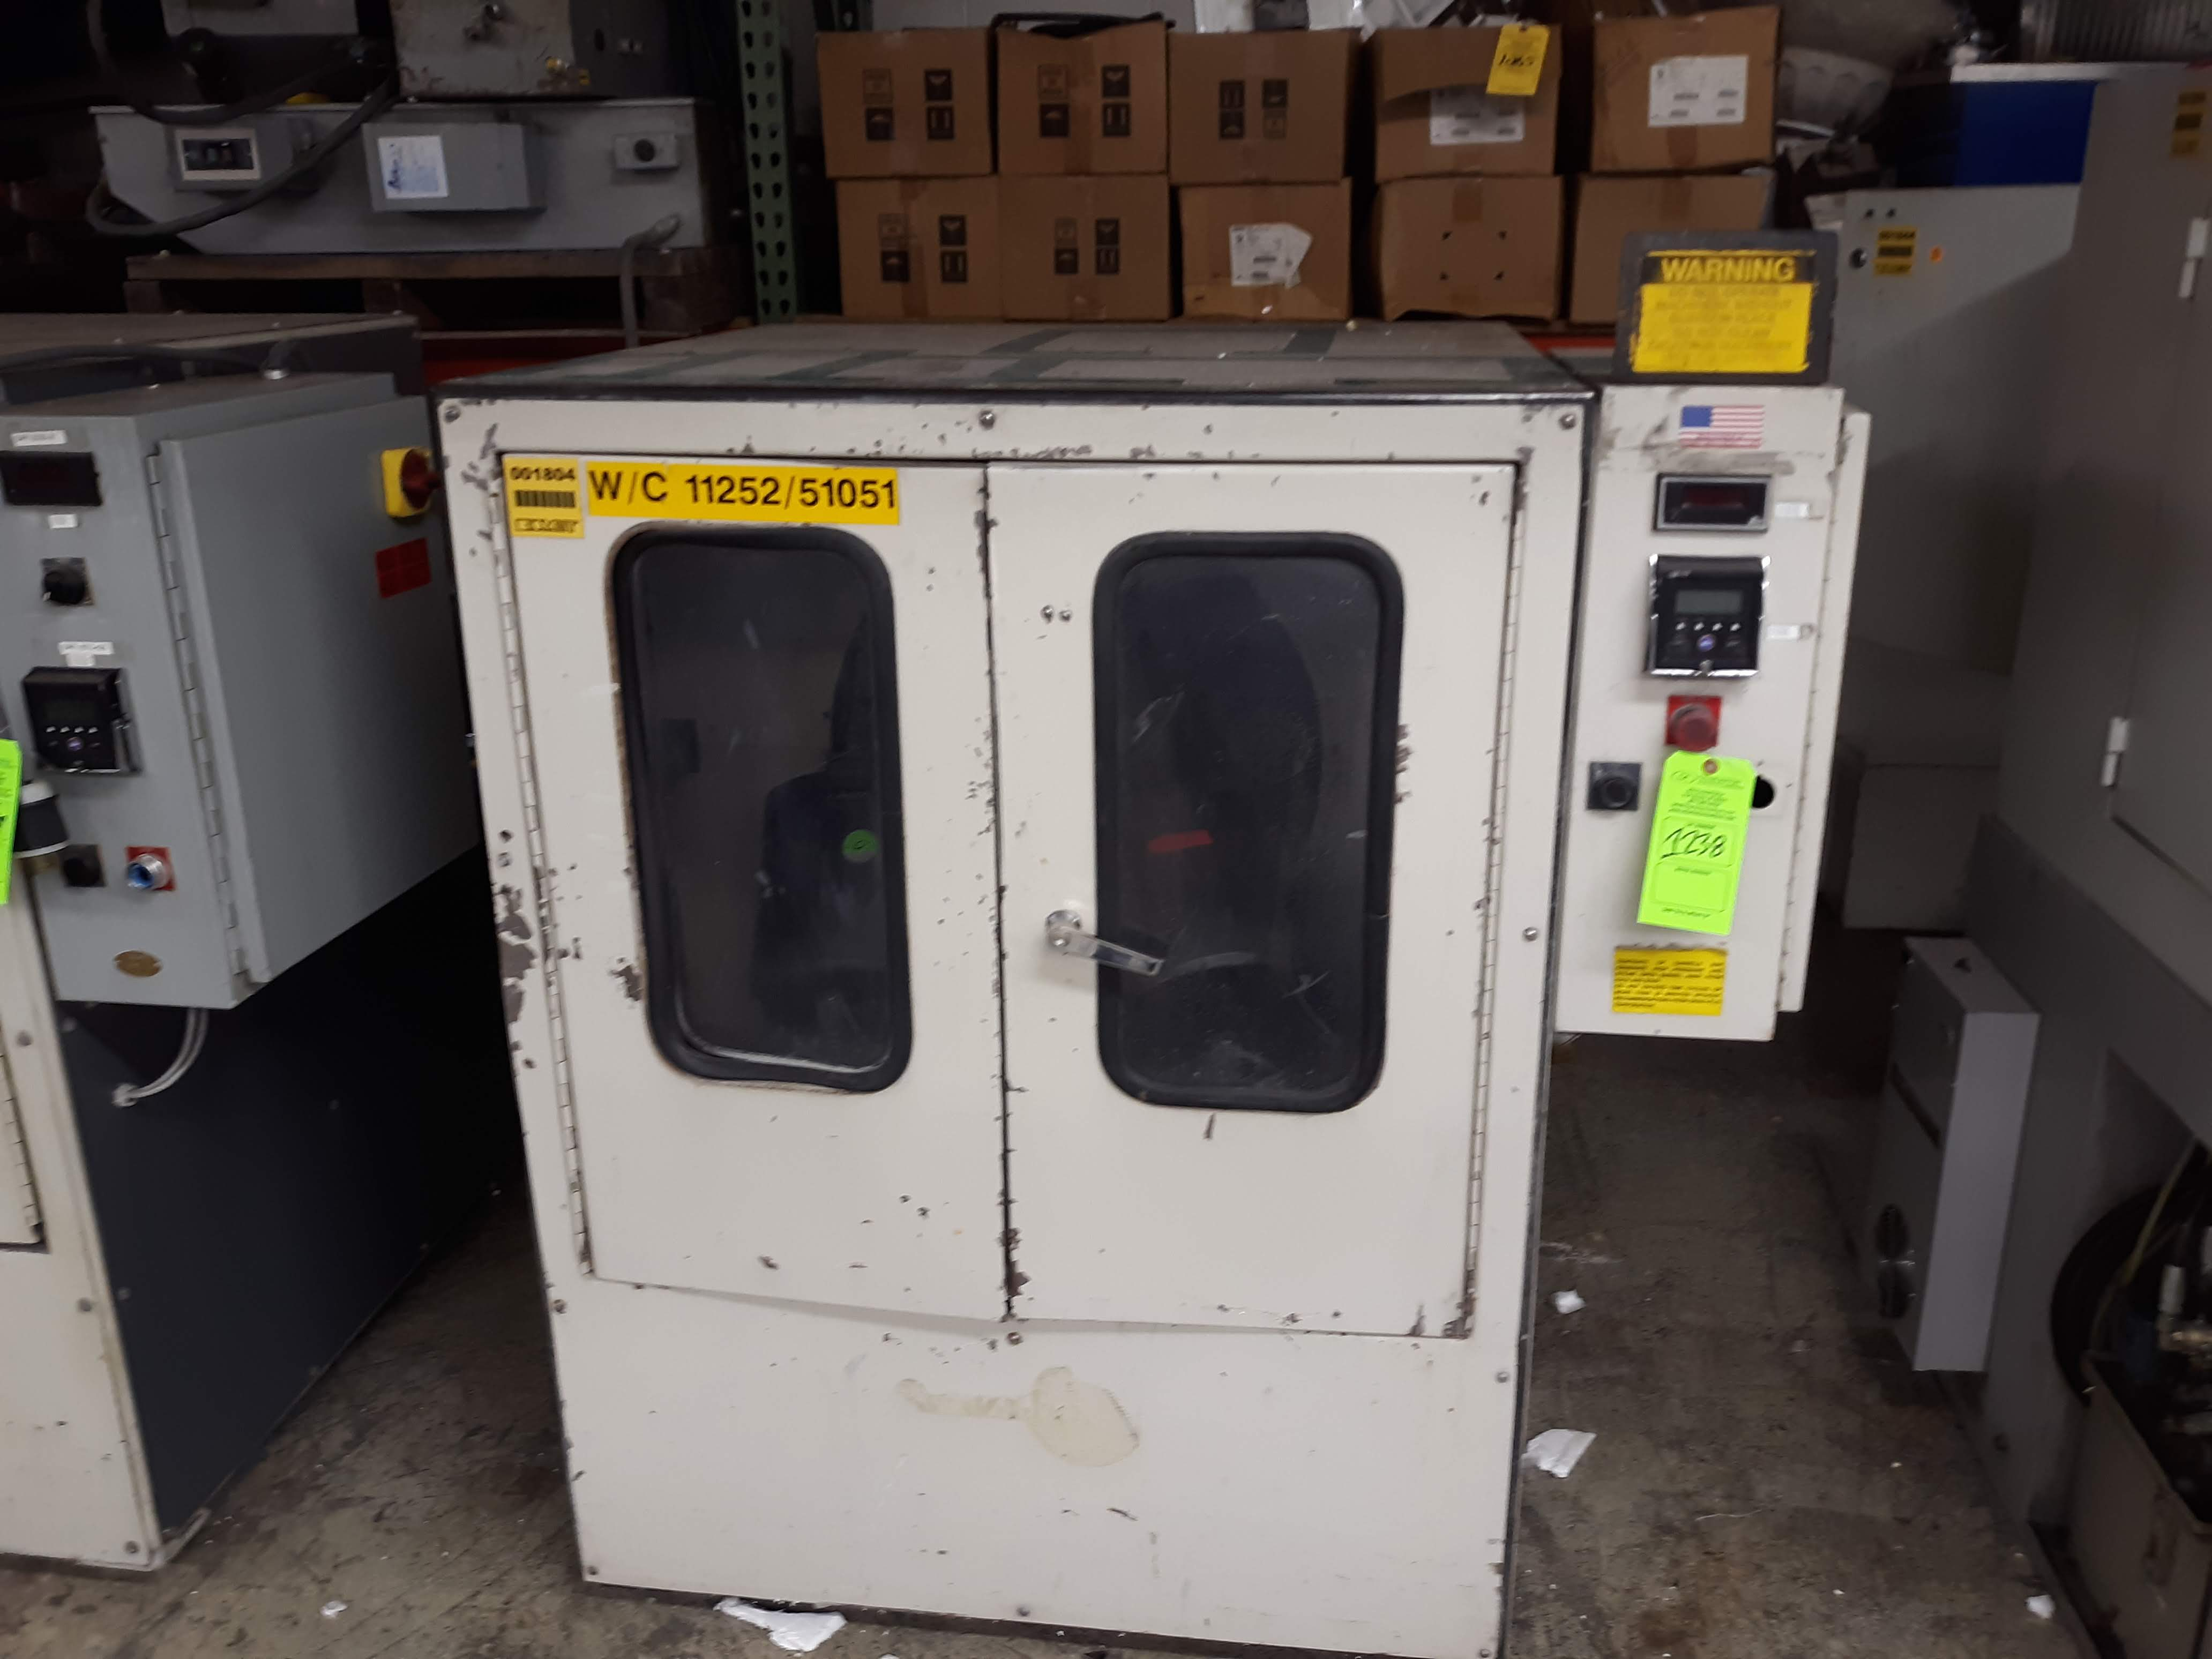 GRAV-I-FLO CENTRIFUGAL BARREL FINISHING MACHINE MODEL-C-4-806 S#175 460V/3PH/60HZ (LOCATED AT: 433